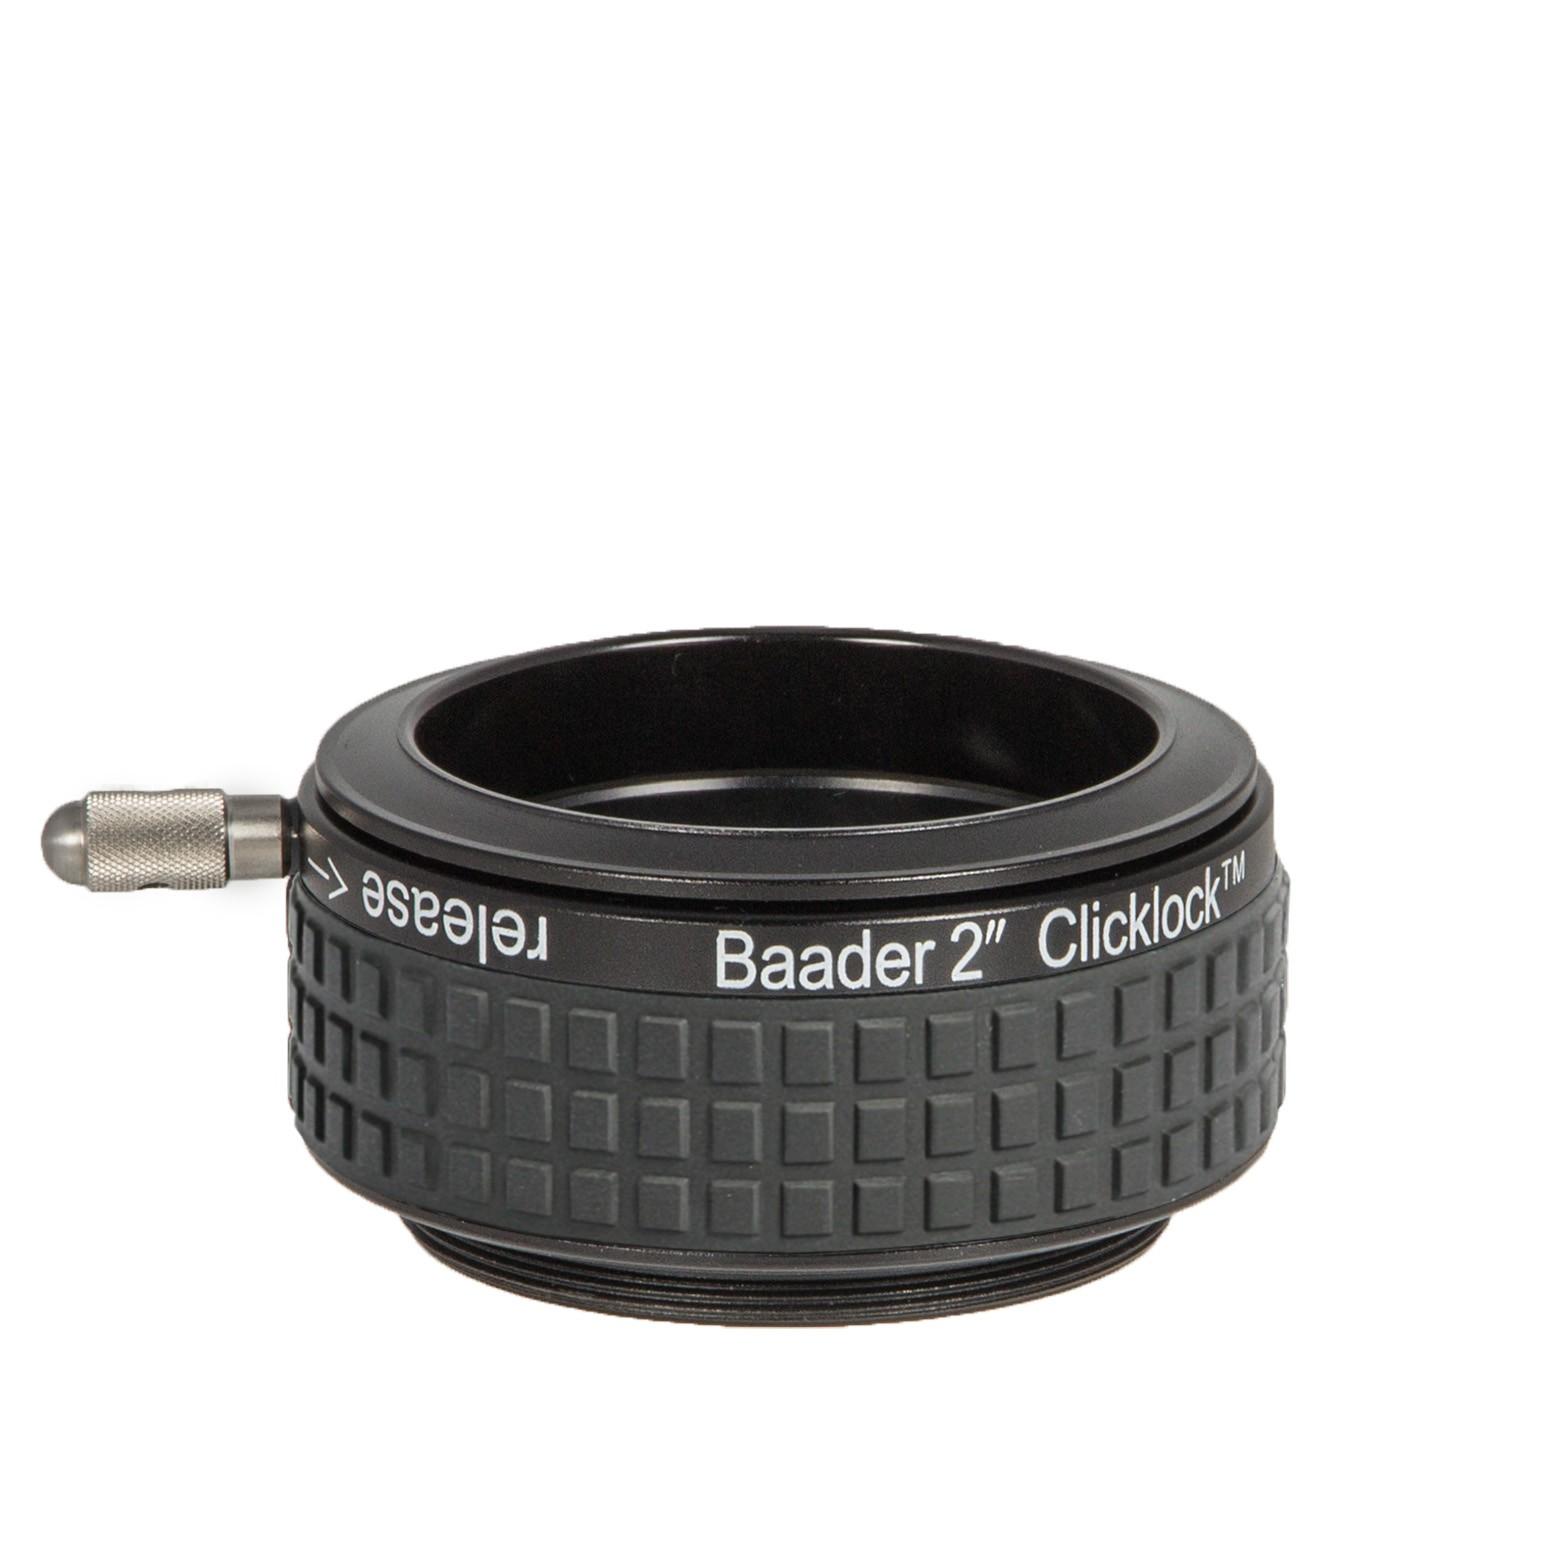 "Baader 2"" ClickLock clamp M54 (Skywatcher)"